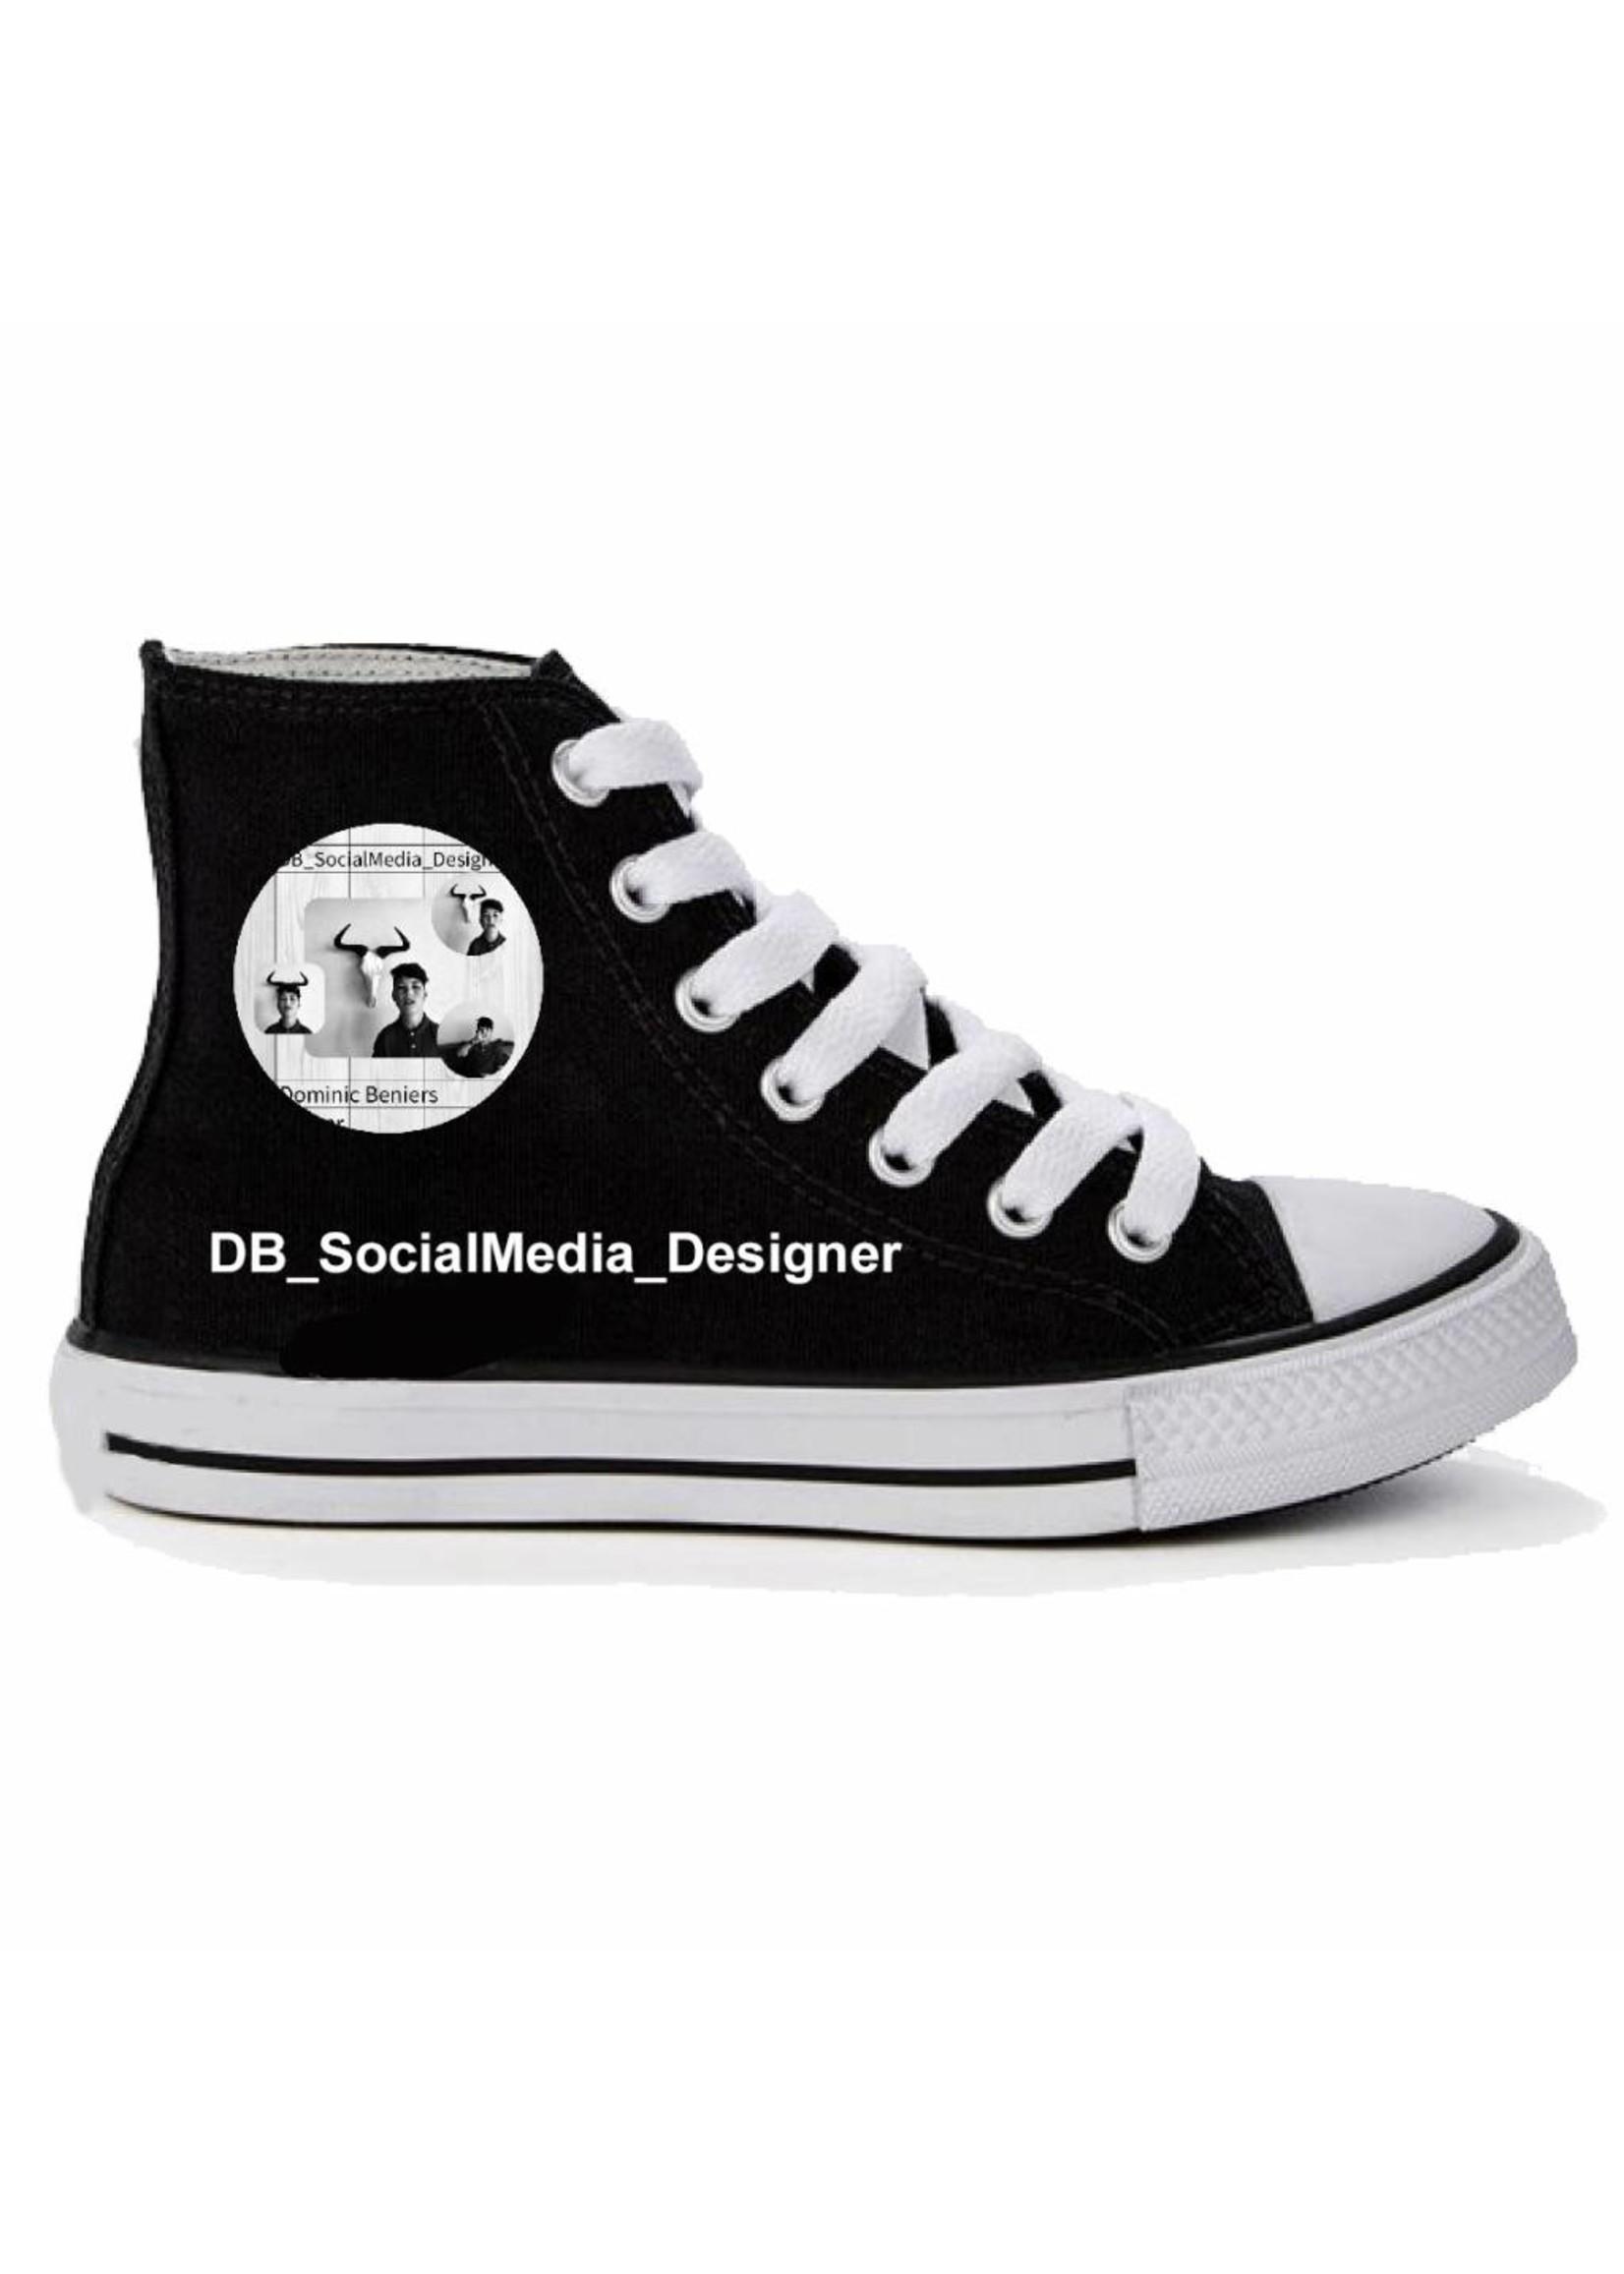 Sneaker met eigen logo